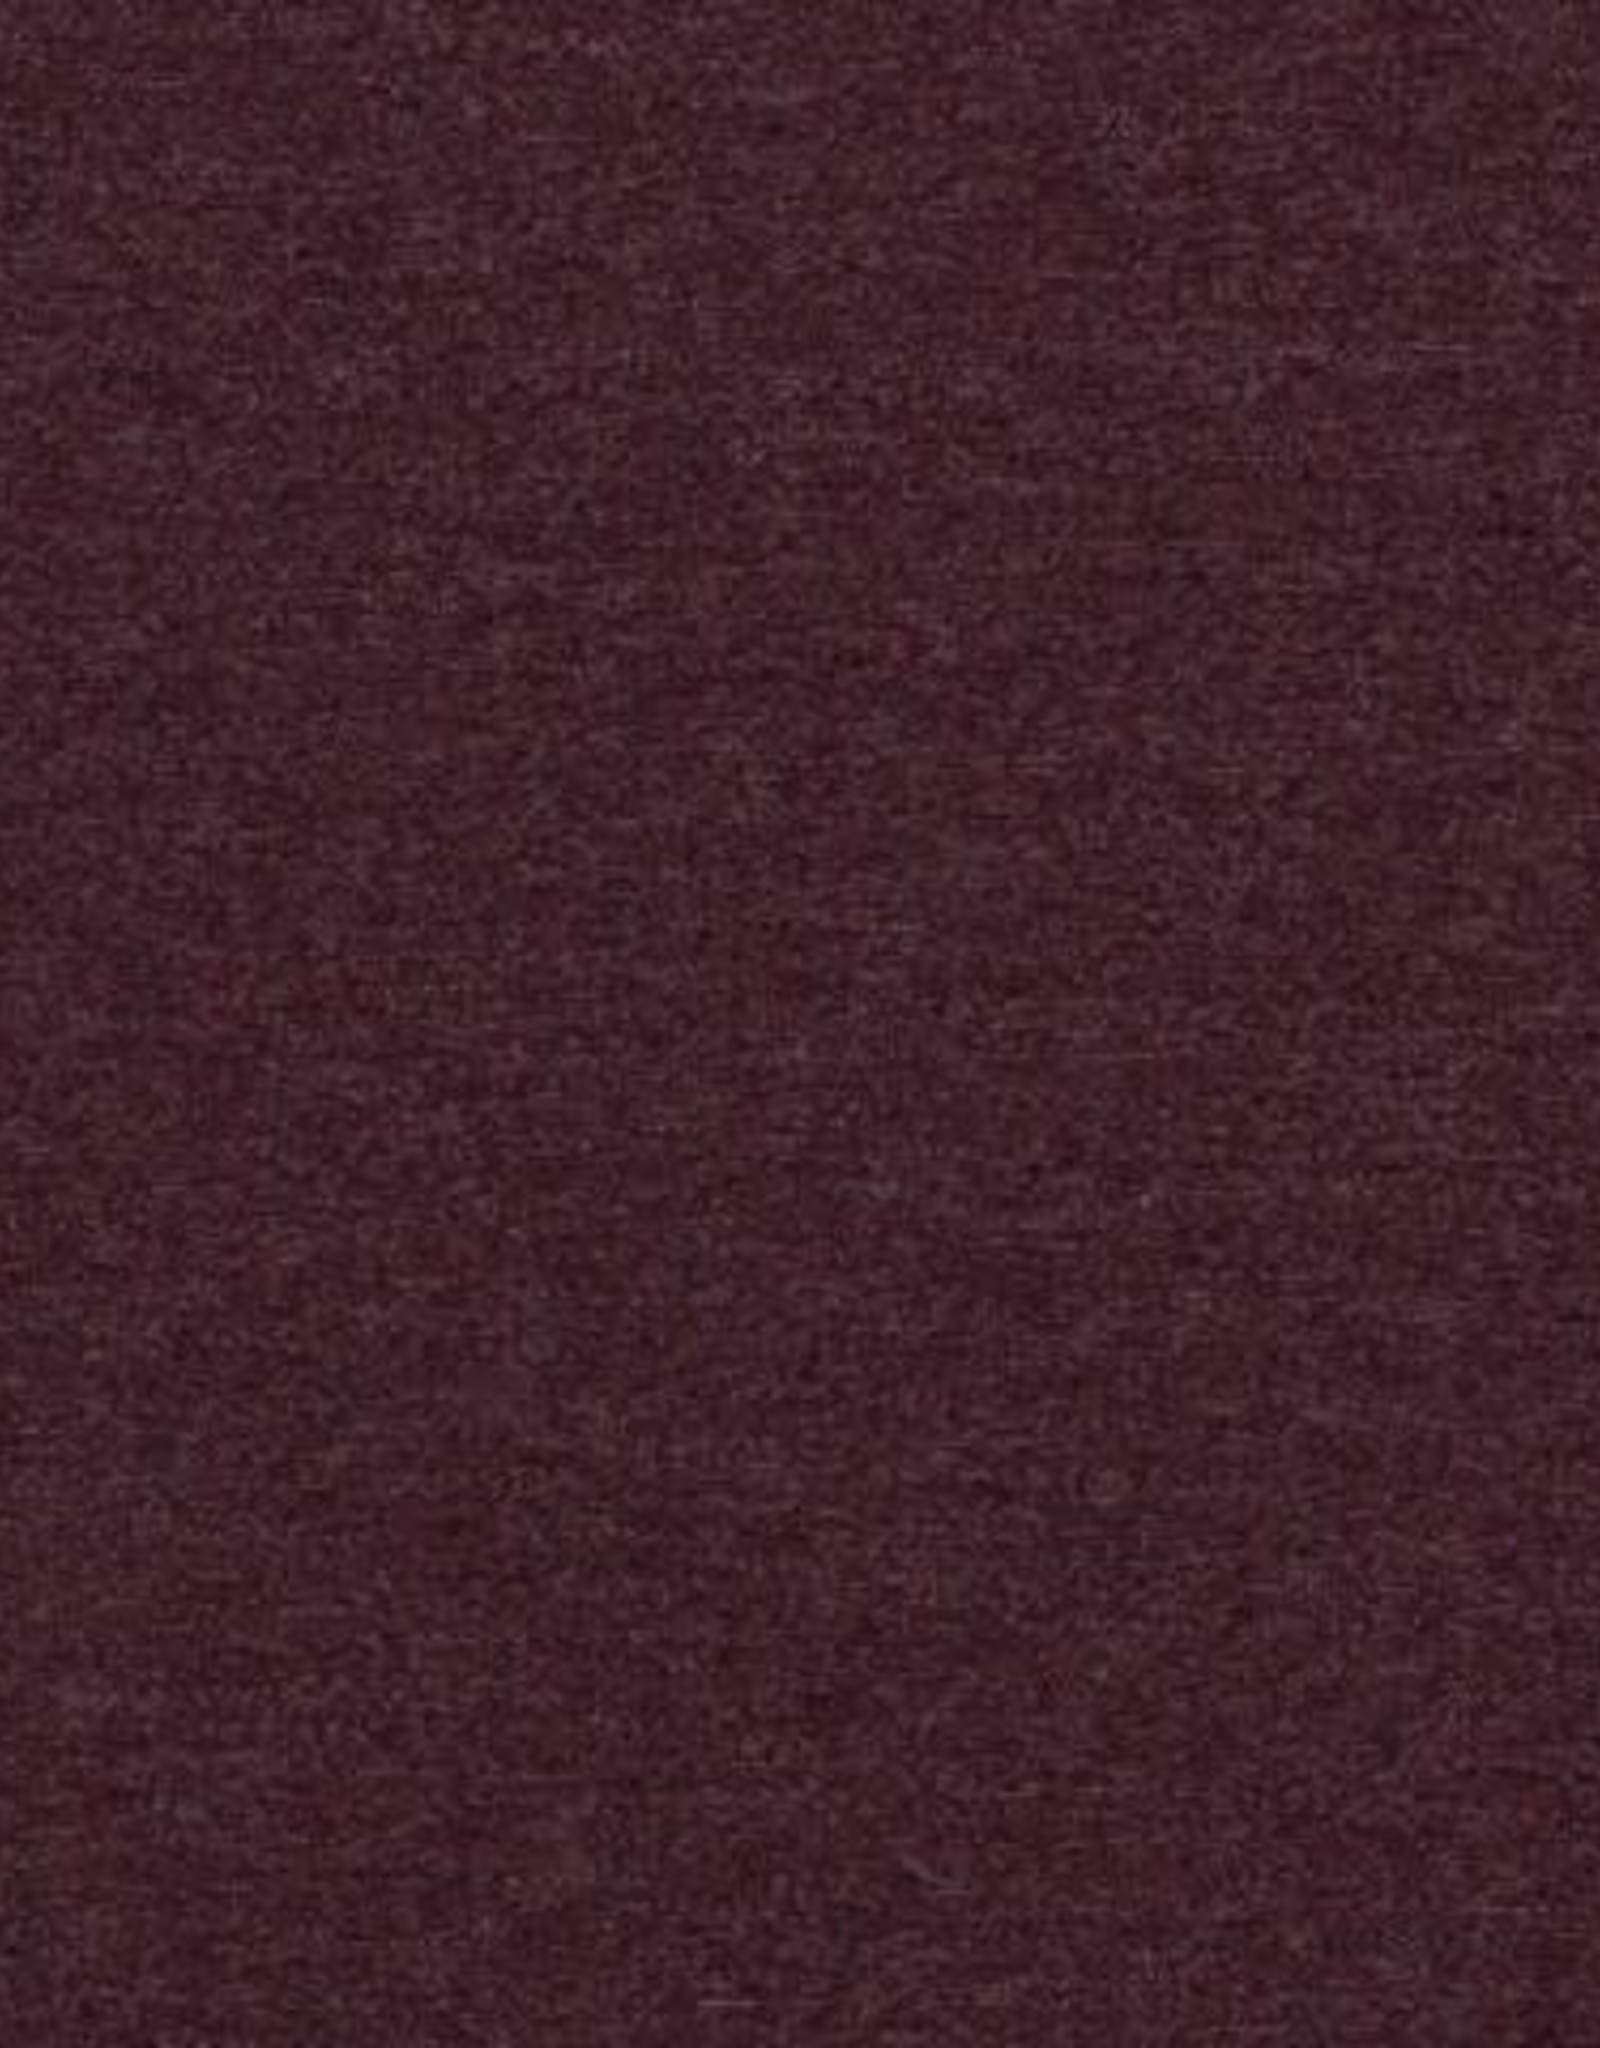 Bordeaux knitted melange